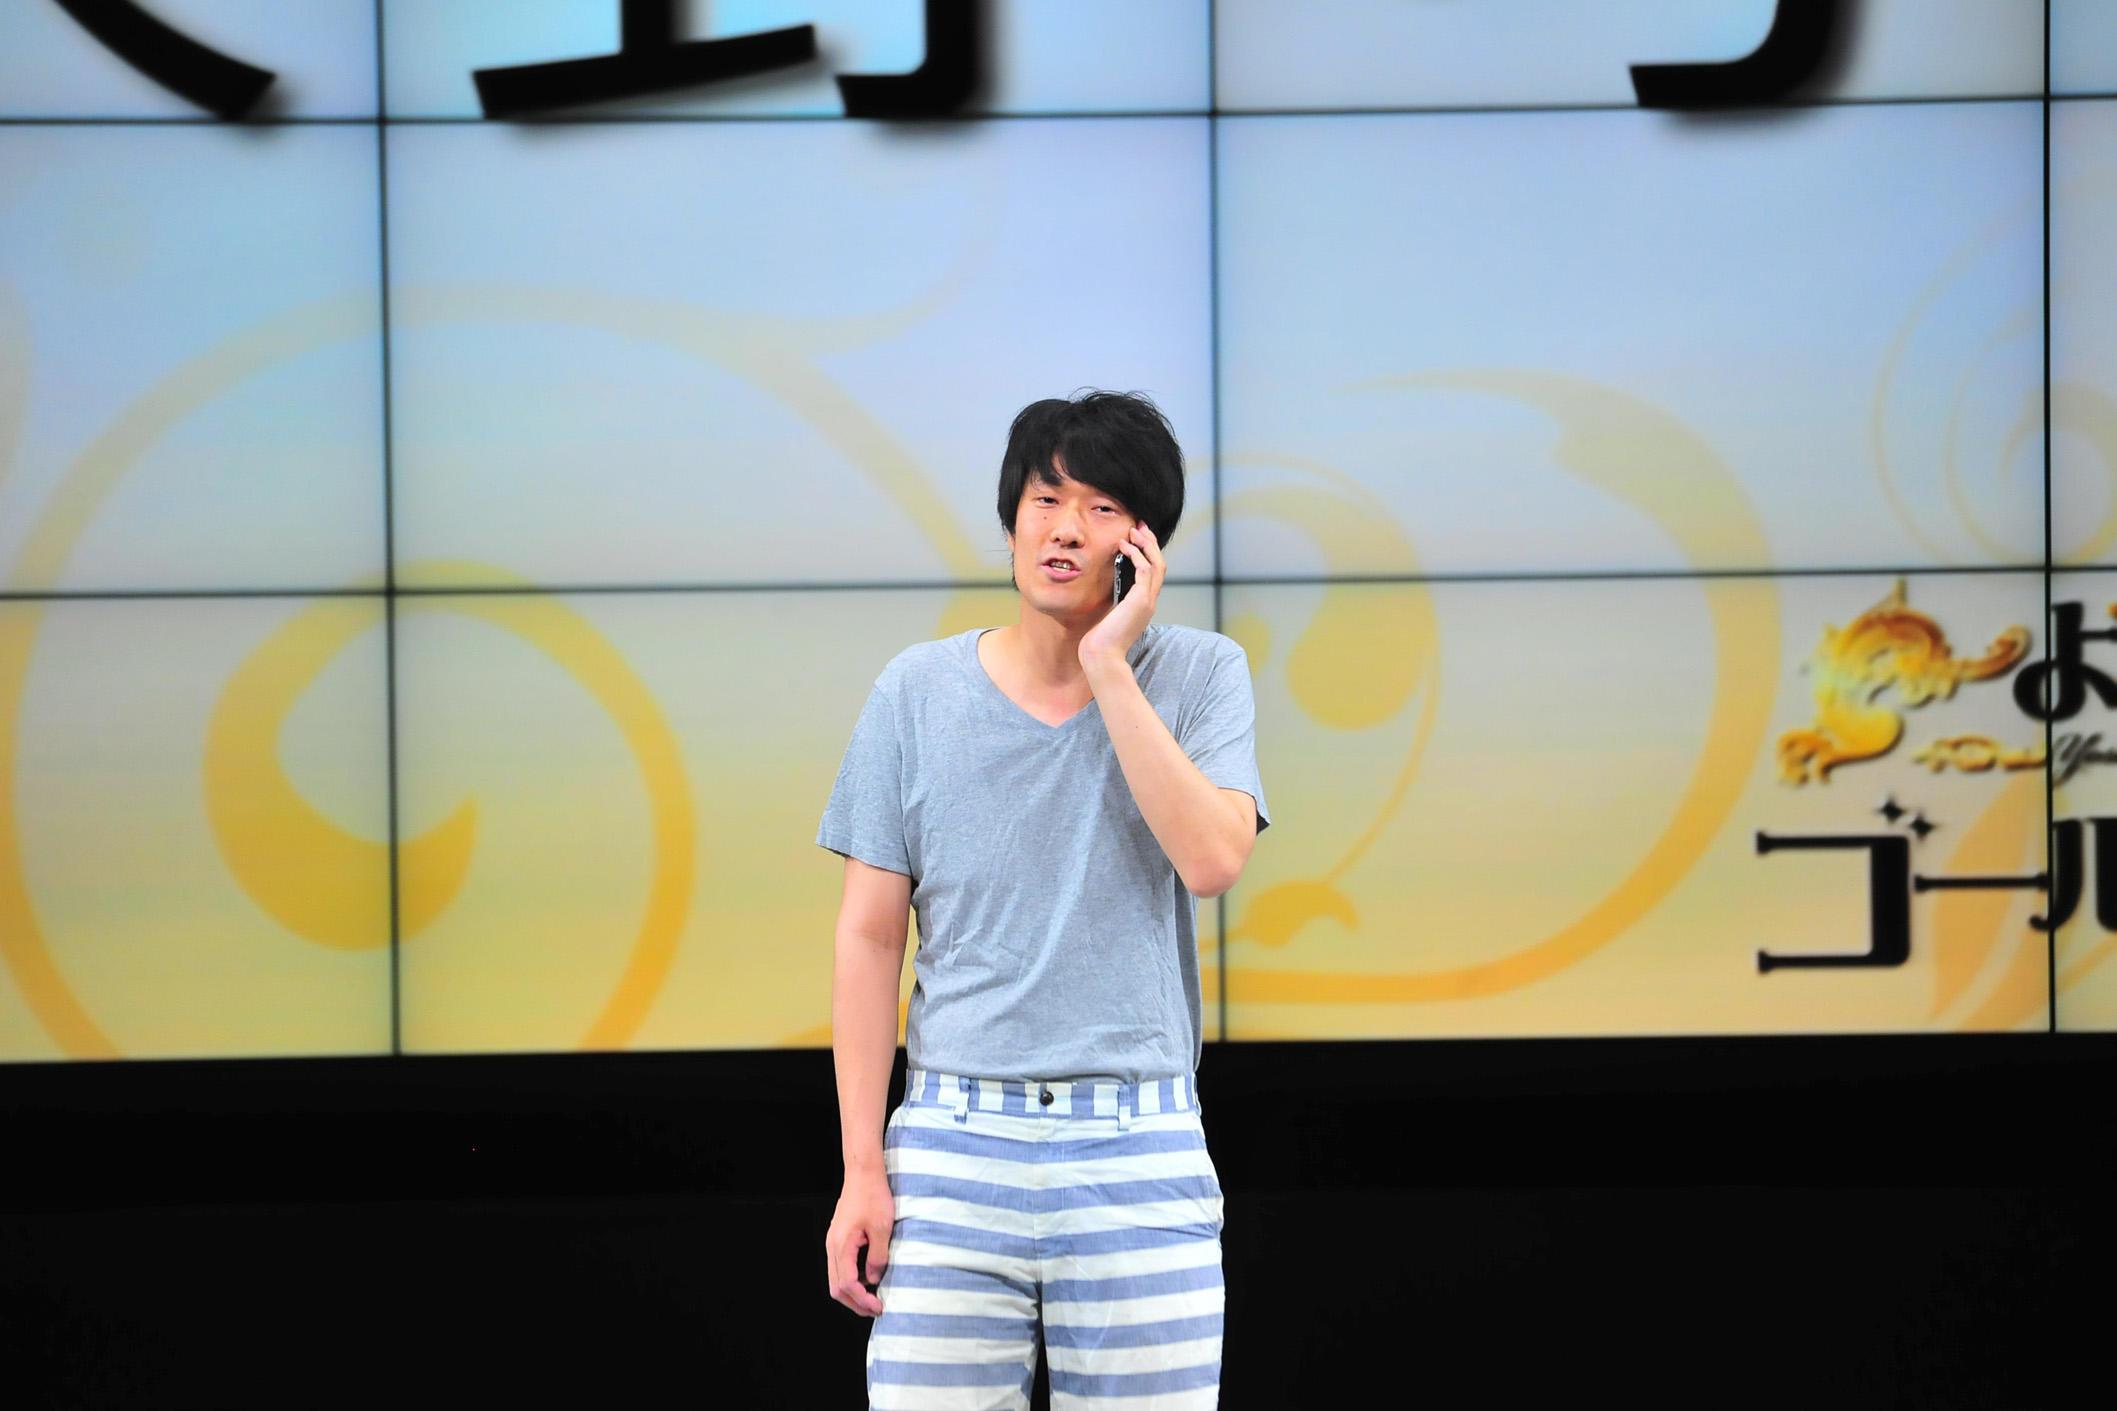 http://news.yoshimoto.co.jp/20160429204544-5a907af765d14fbb3b1b26b16ea62ed121f44e14.jpg